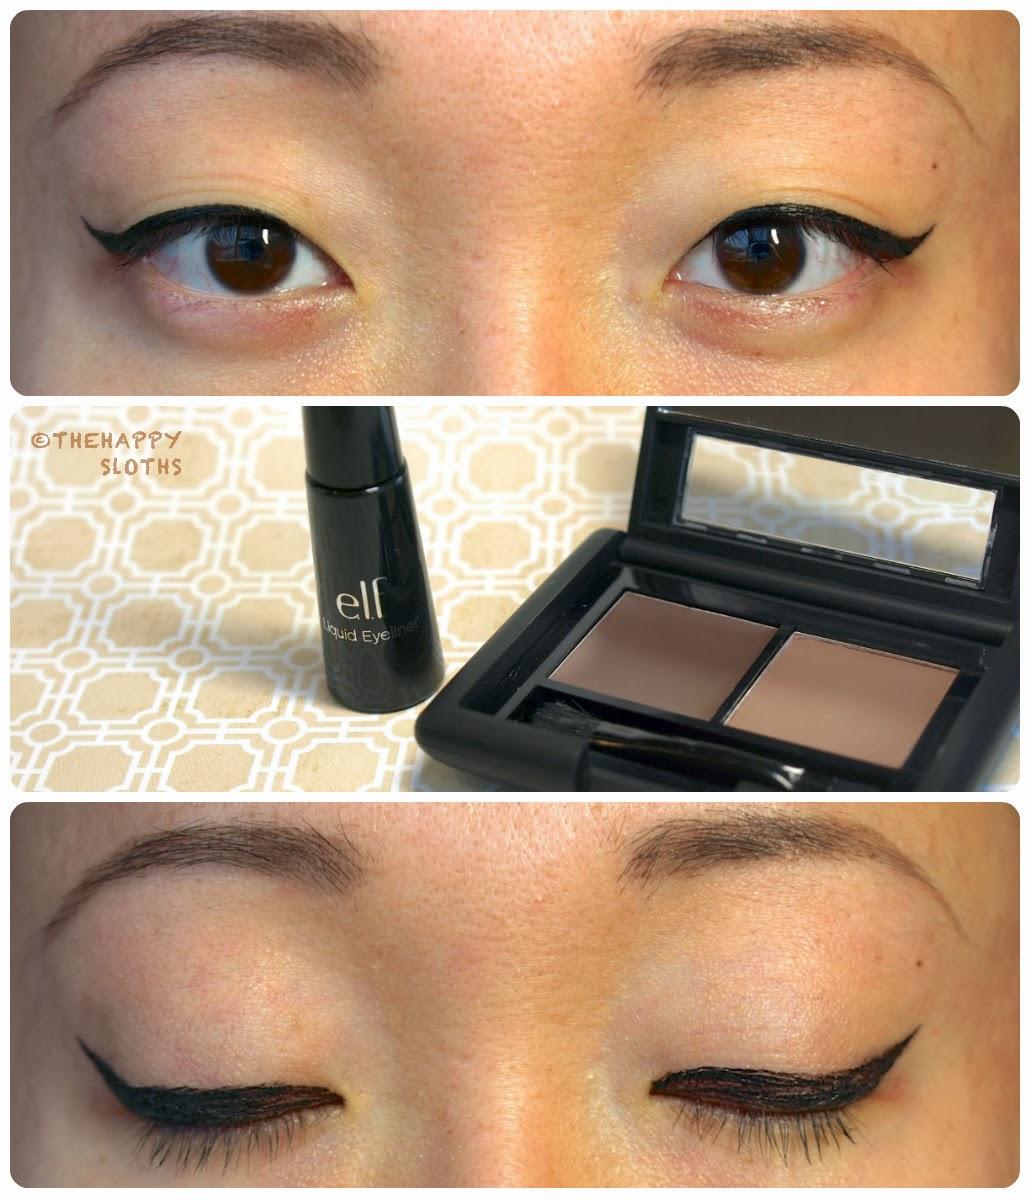 e.l.f. Cosmetics Studio Eyebrow Kit & Essential Liquid ...